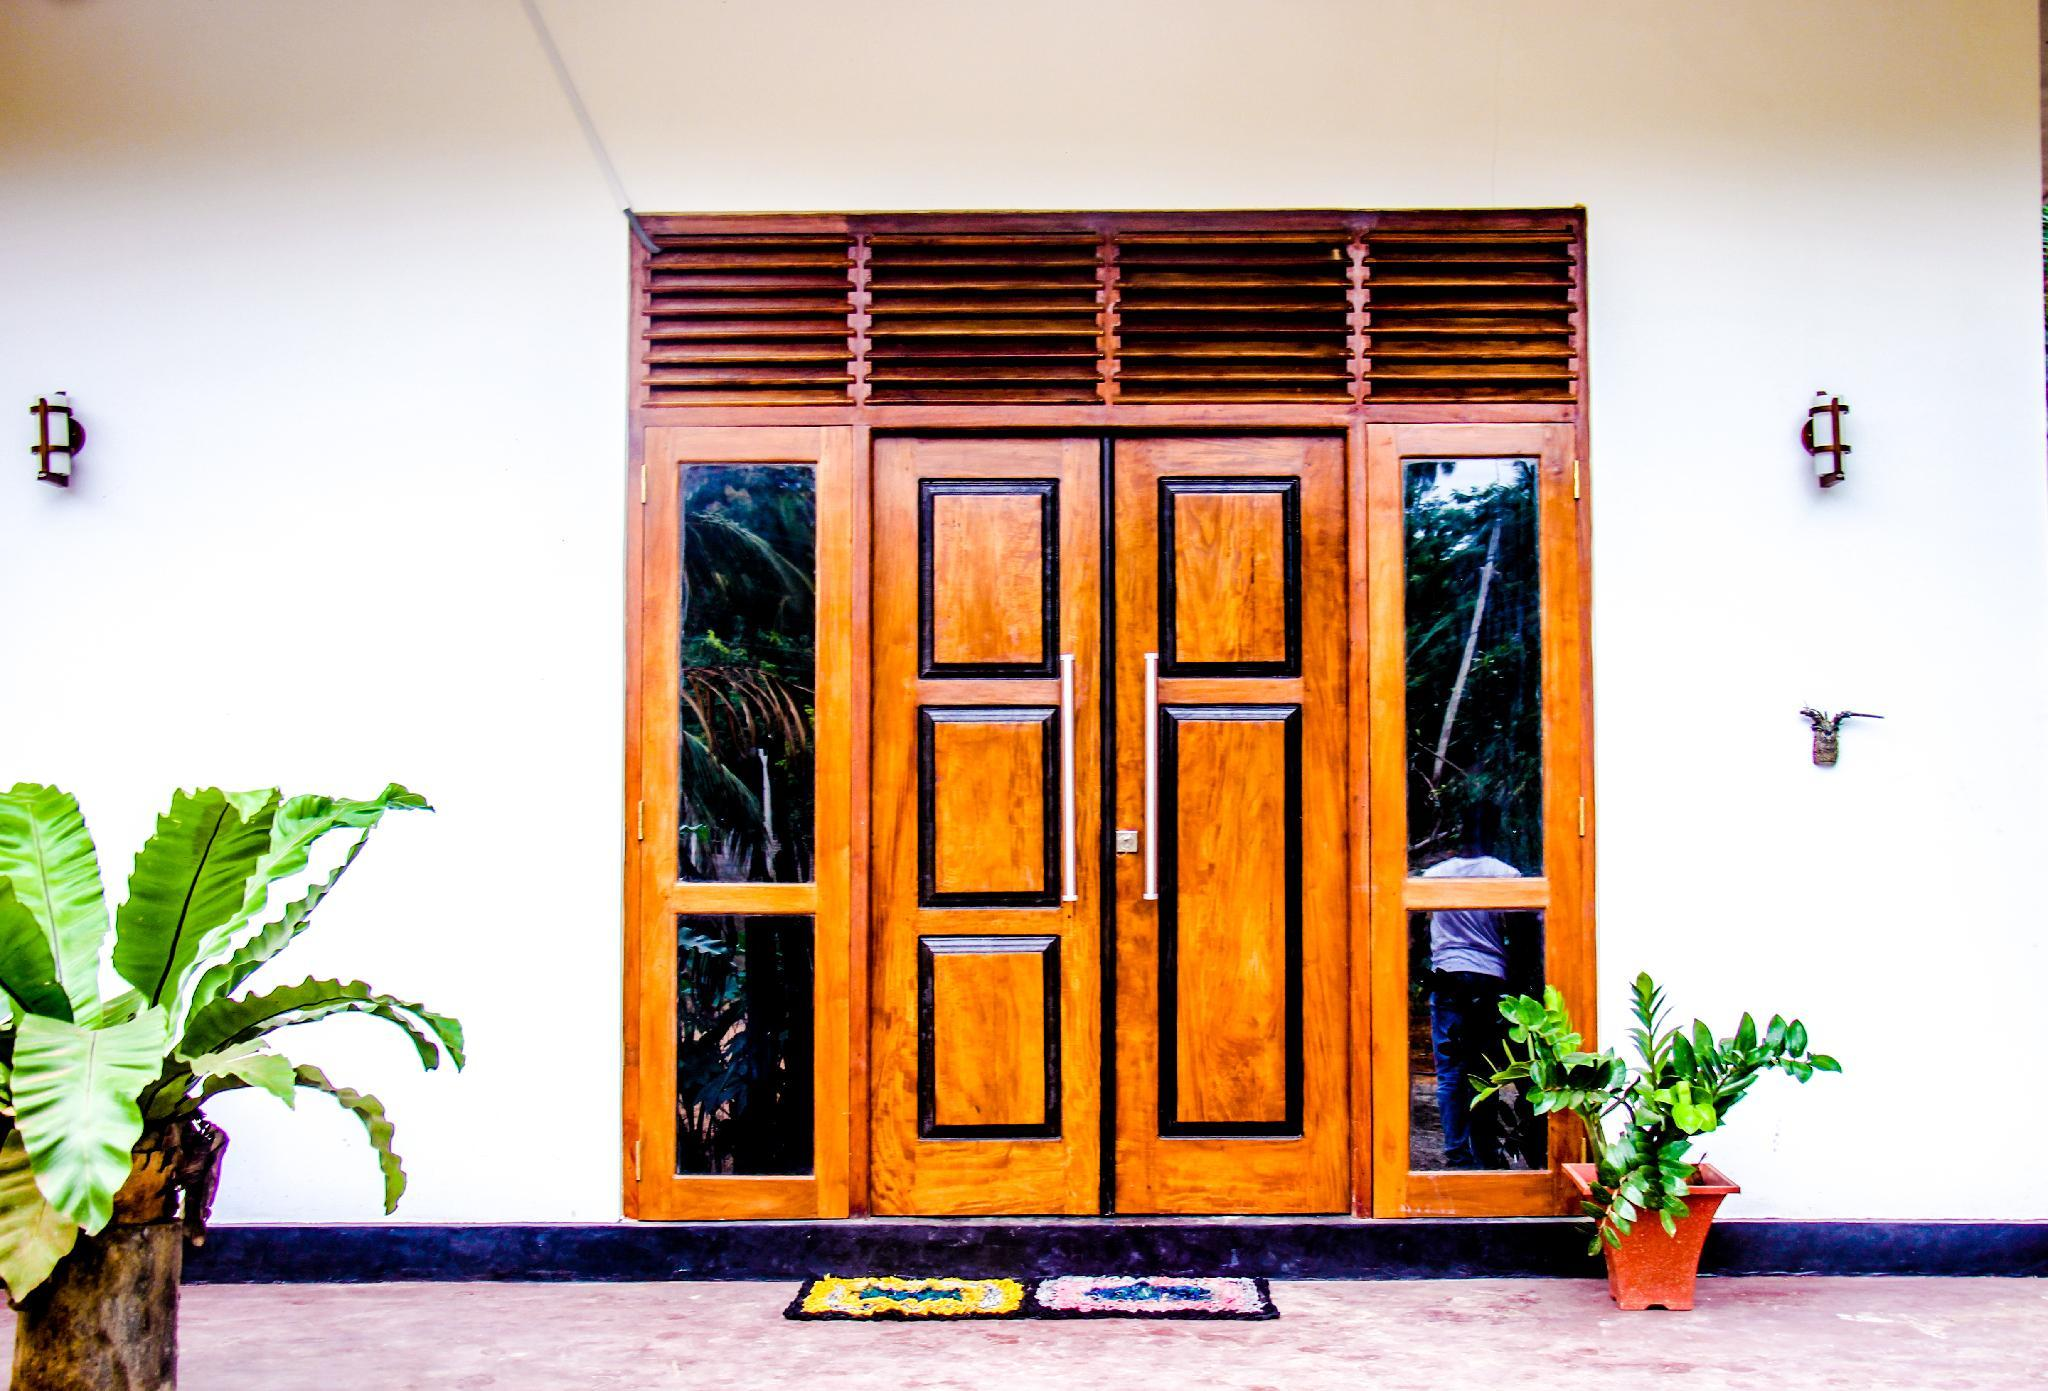 Sanjee Place